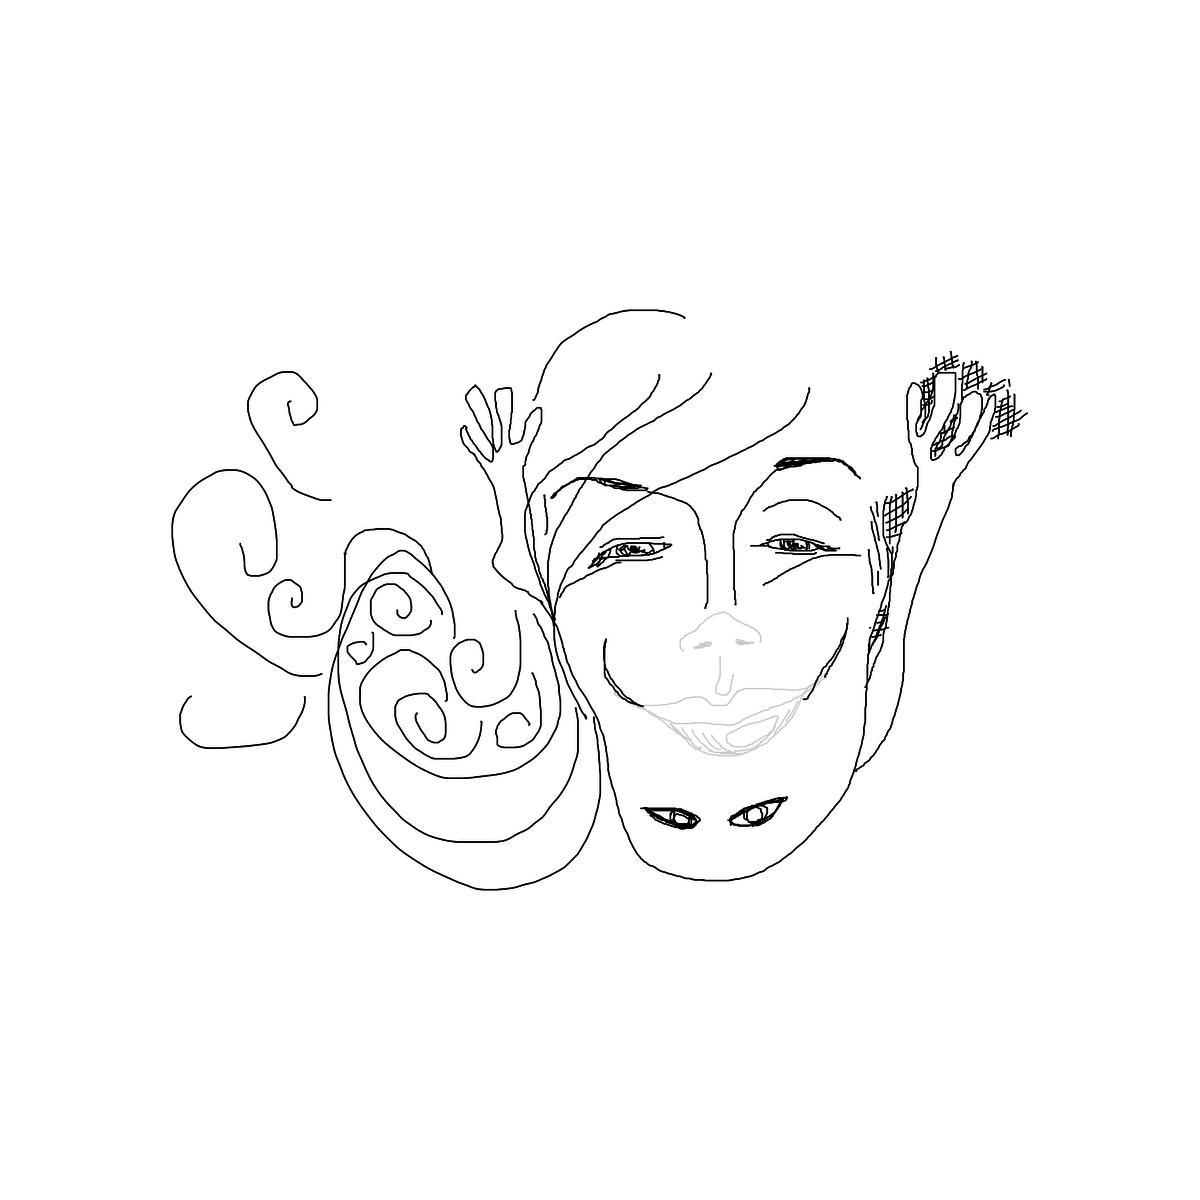 BAAAM drawing#5569 lat:45.4415893554687500lng: -75.6911315917968800